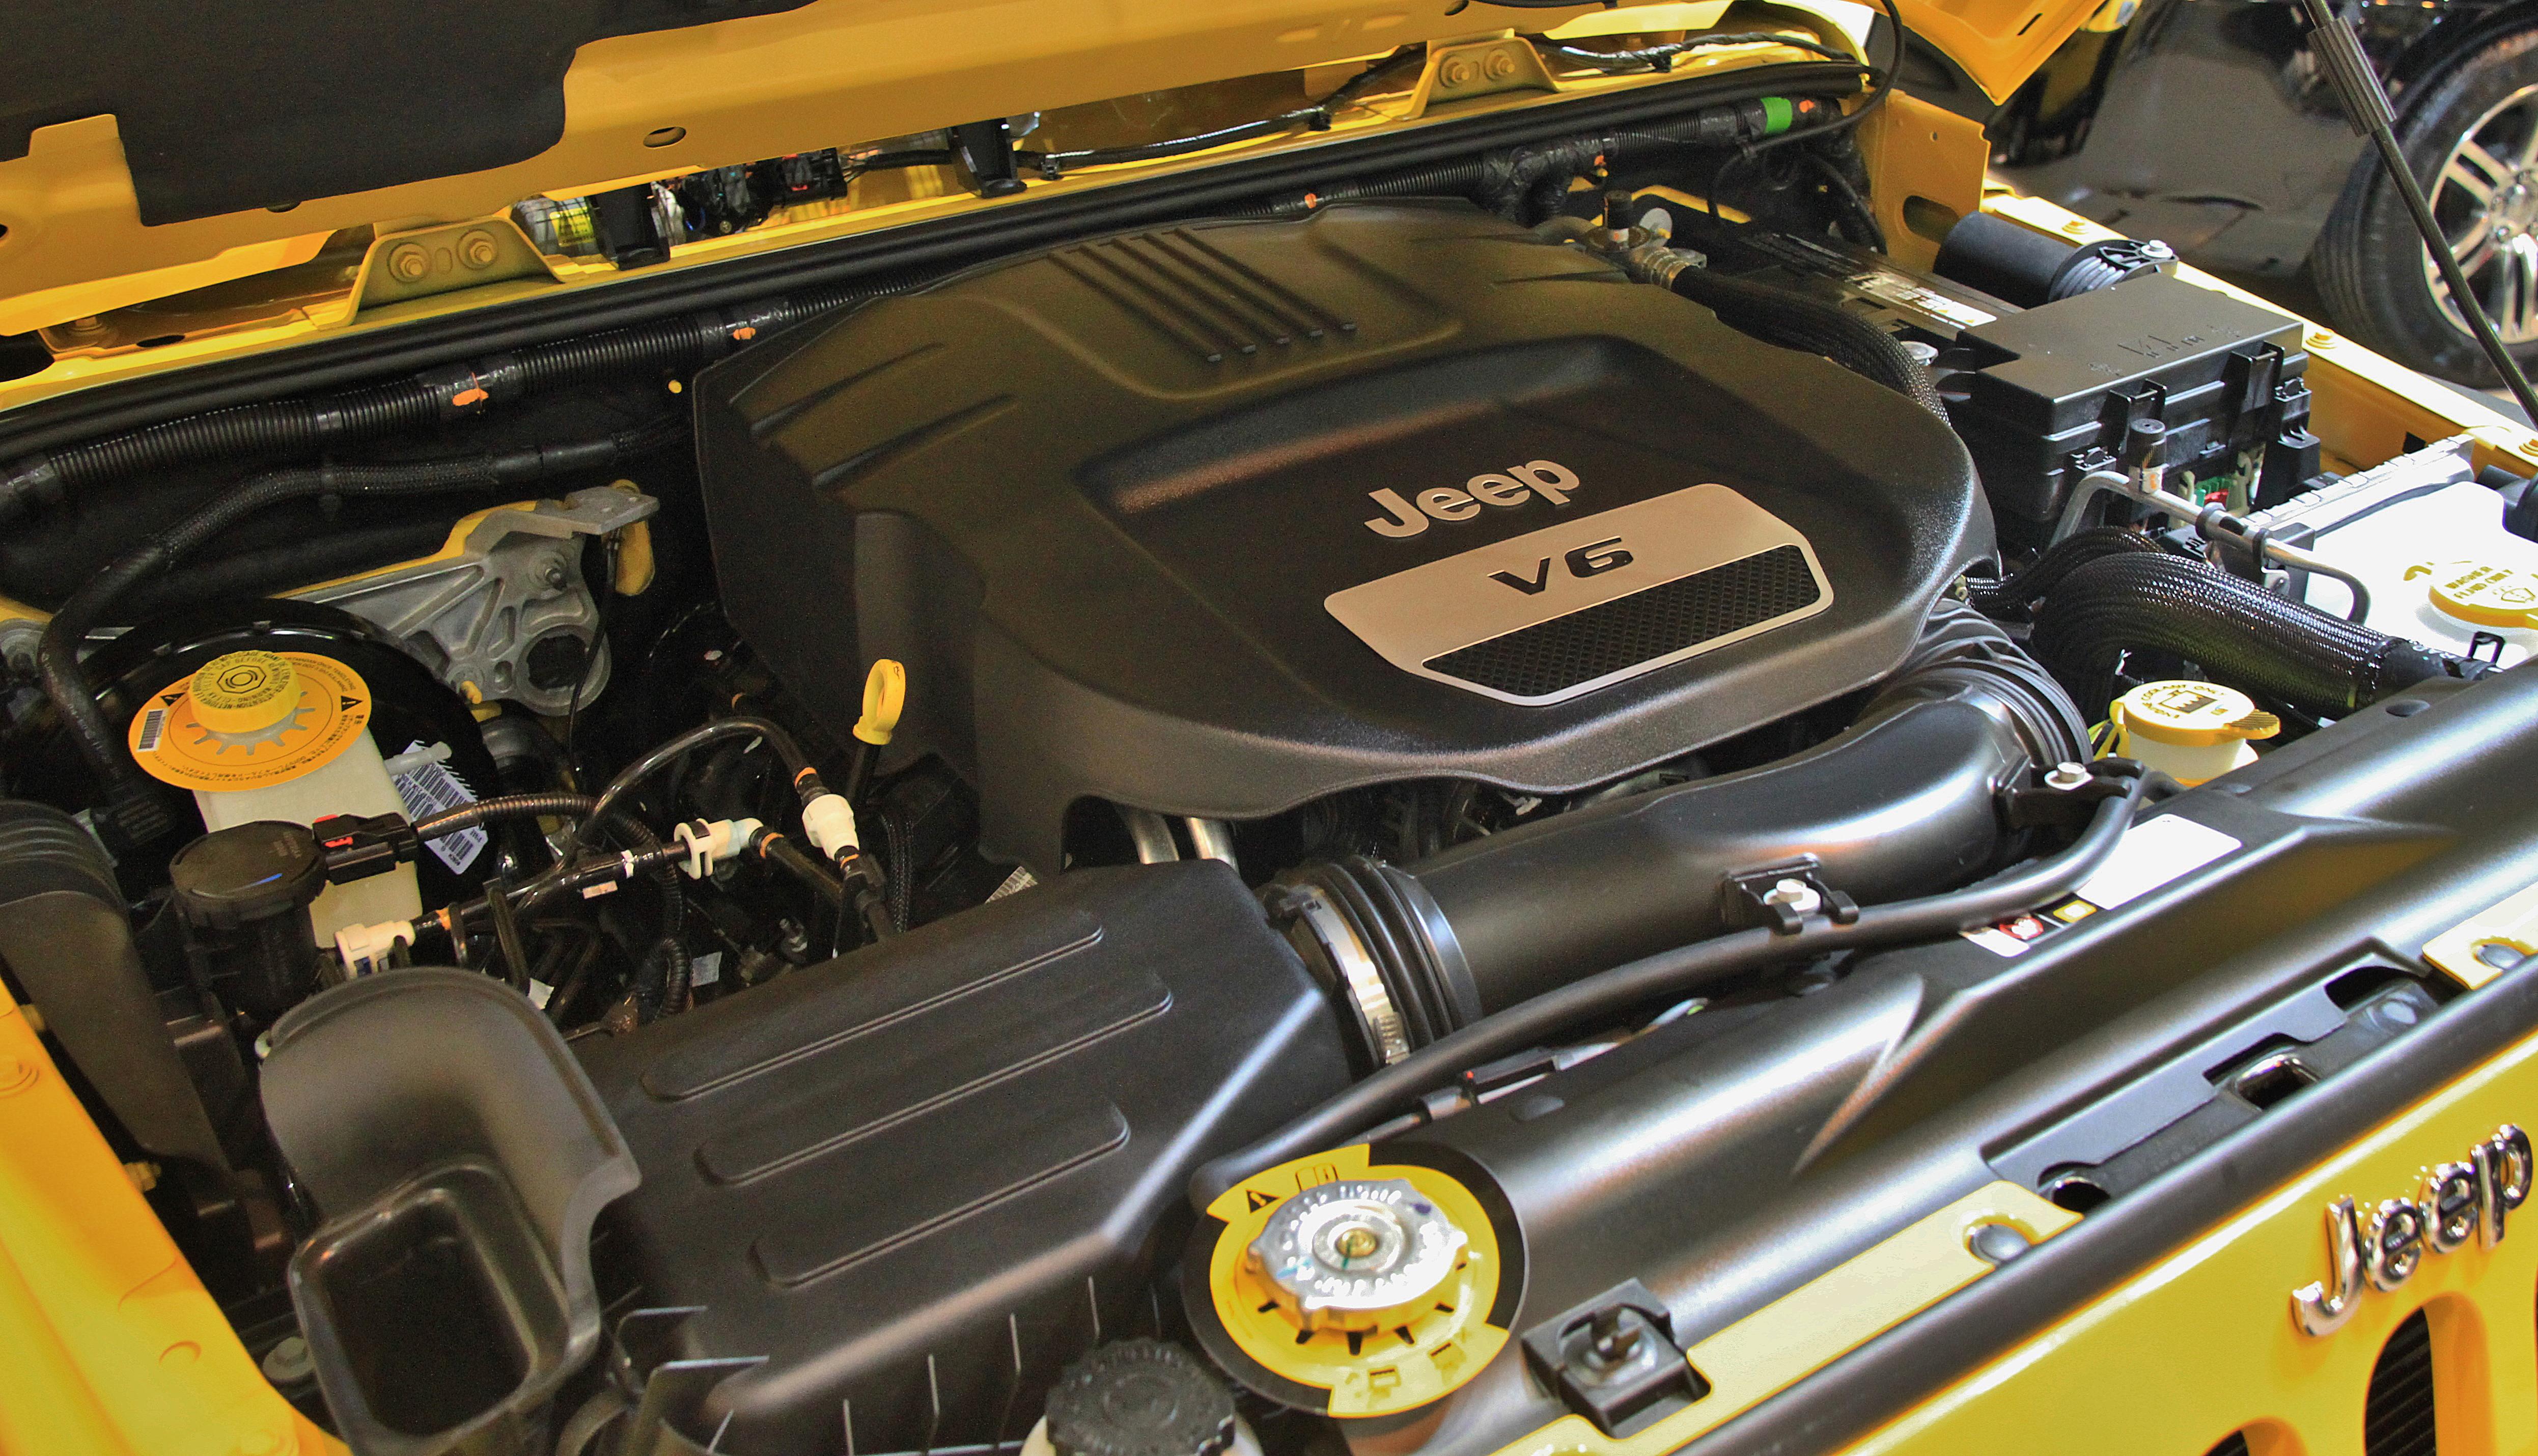 Datei:Jeep Wrangler Unlimited Sport engine.jpg – Wikipedia